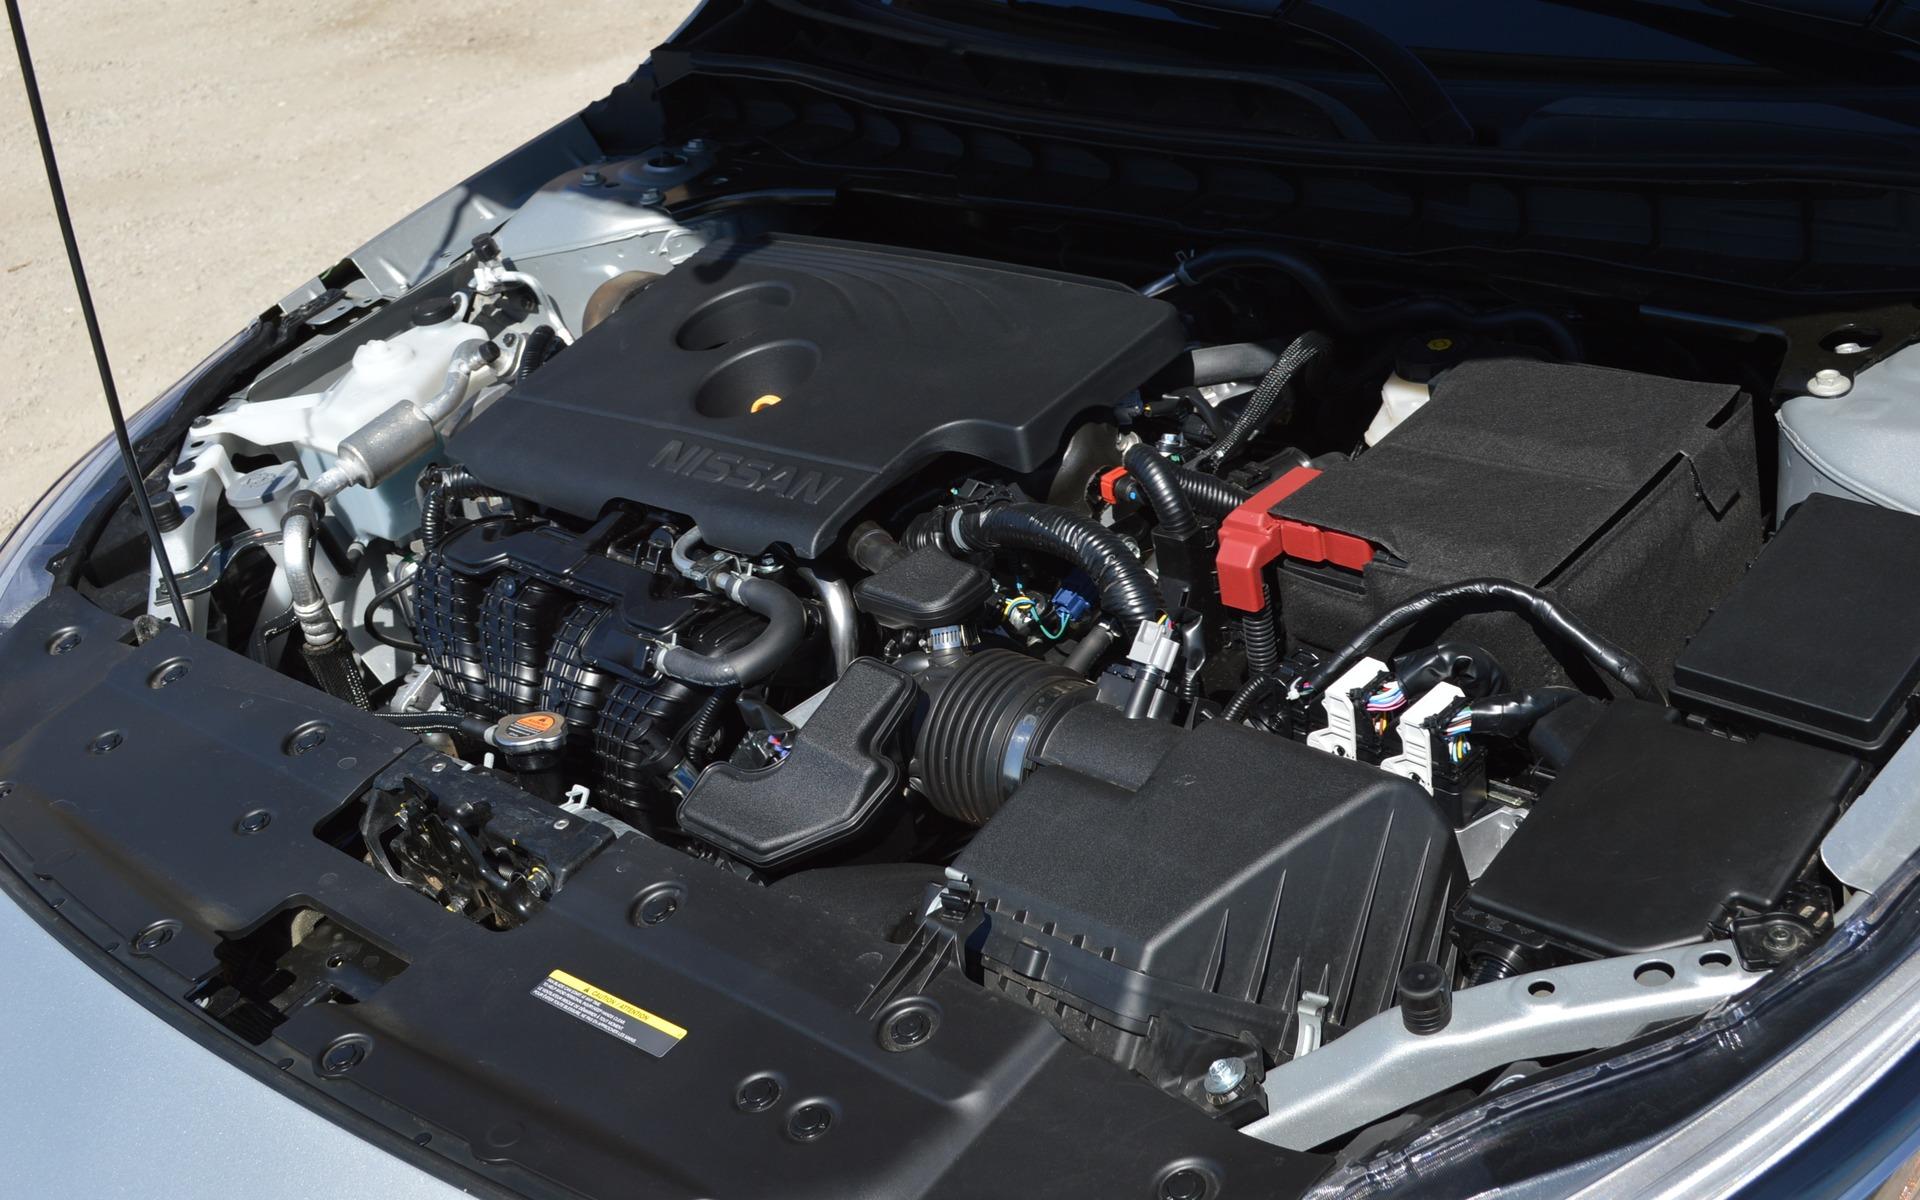 Nissan Altima 2019: enfin un moyen de se distinguer 350271_2019_Nissan_Altima